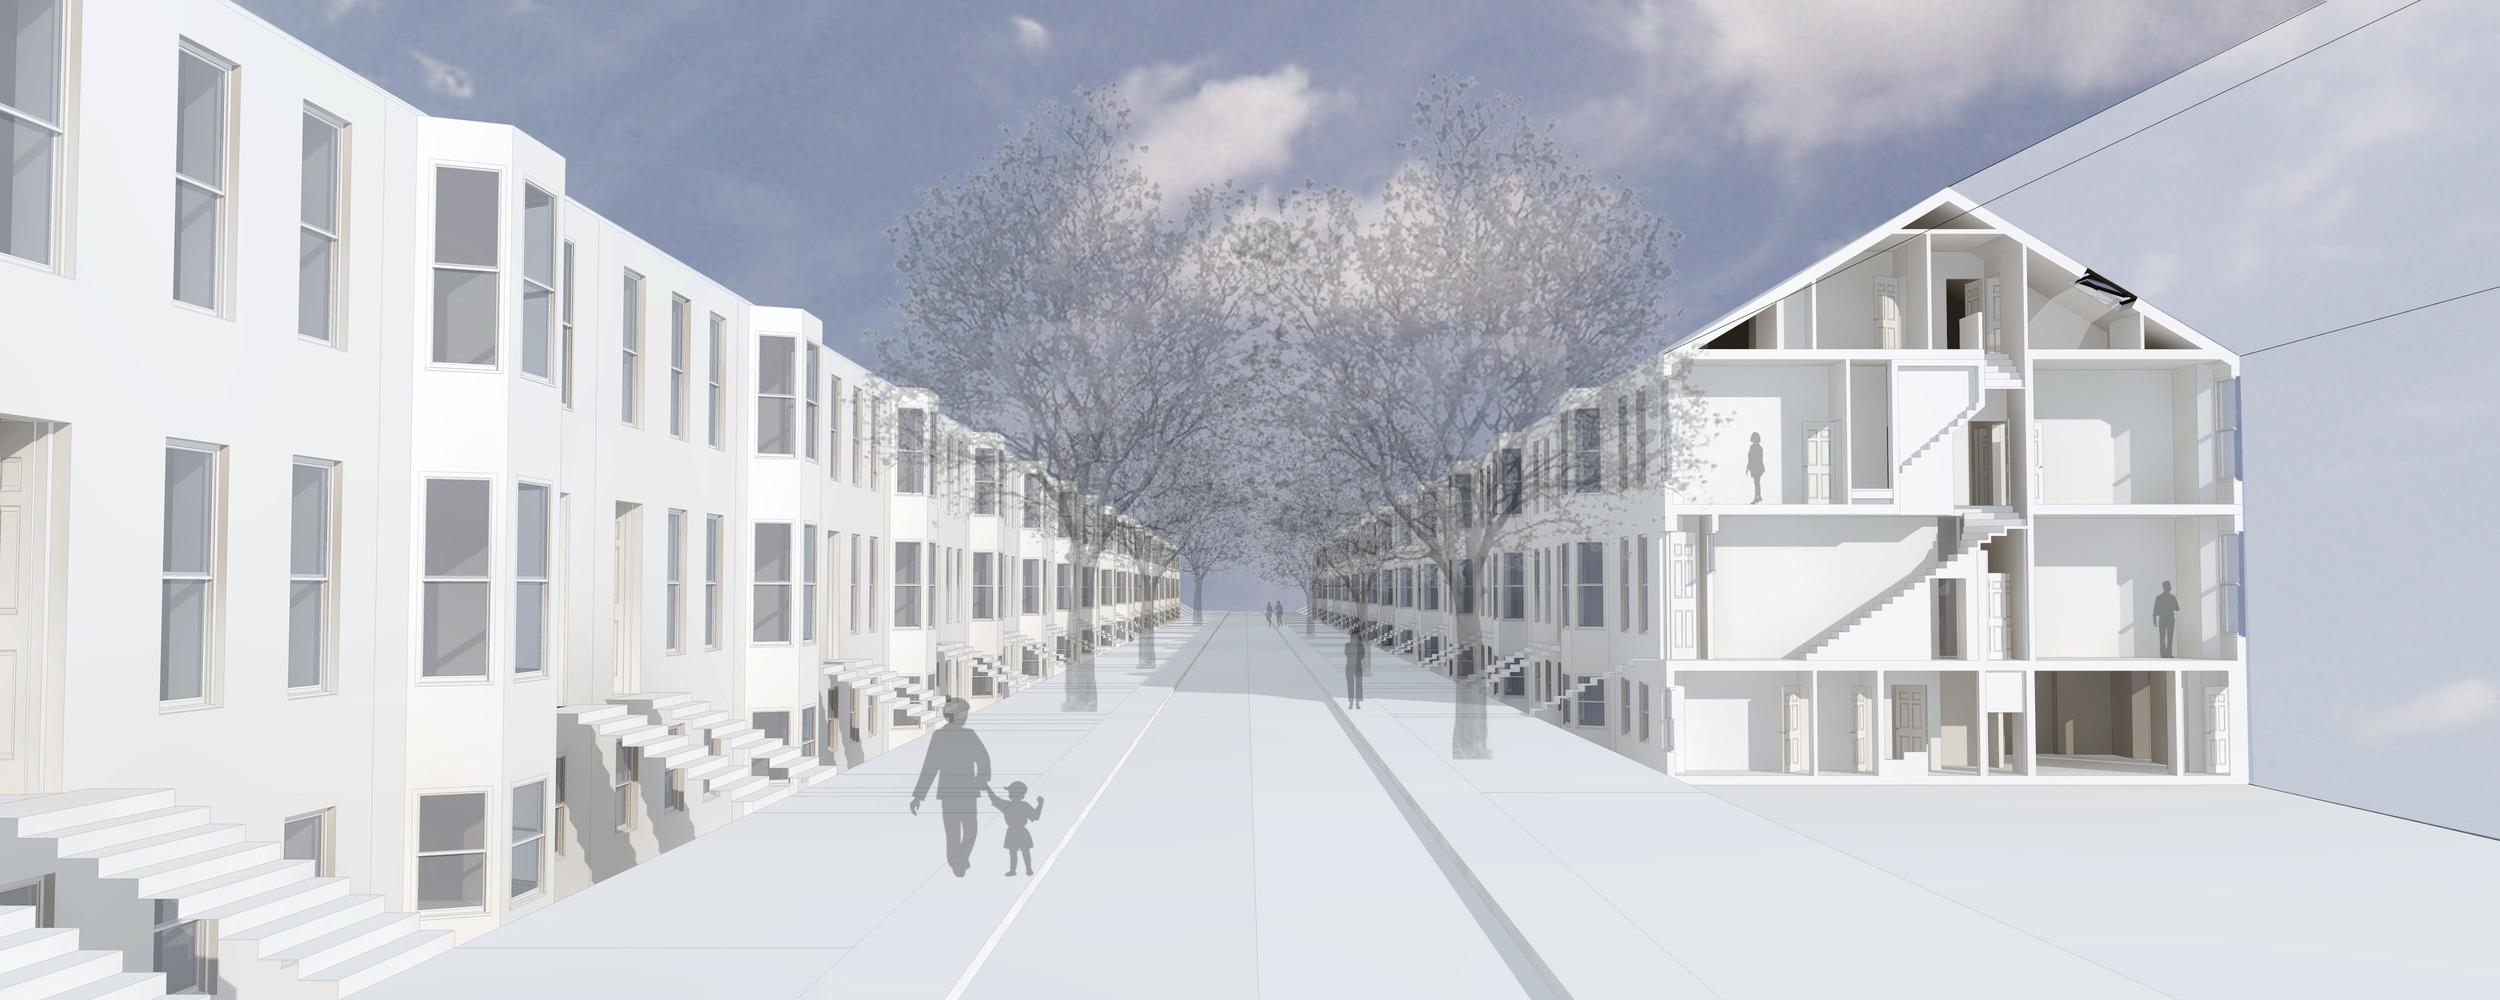 Marywood Street Image